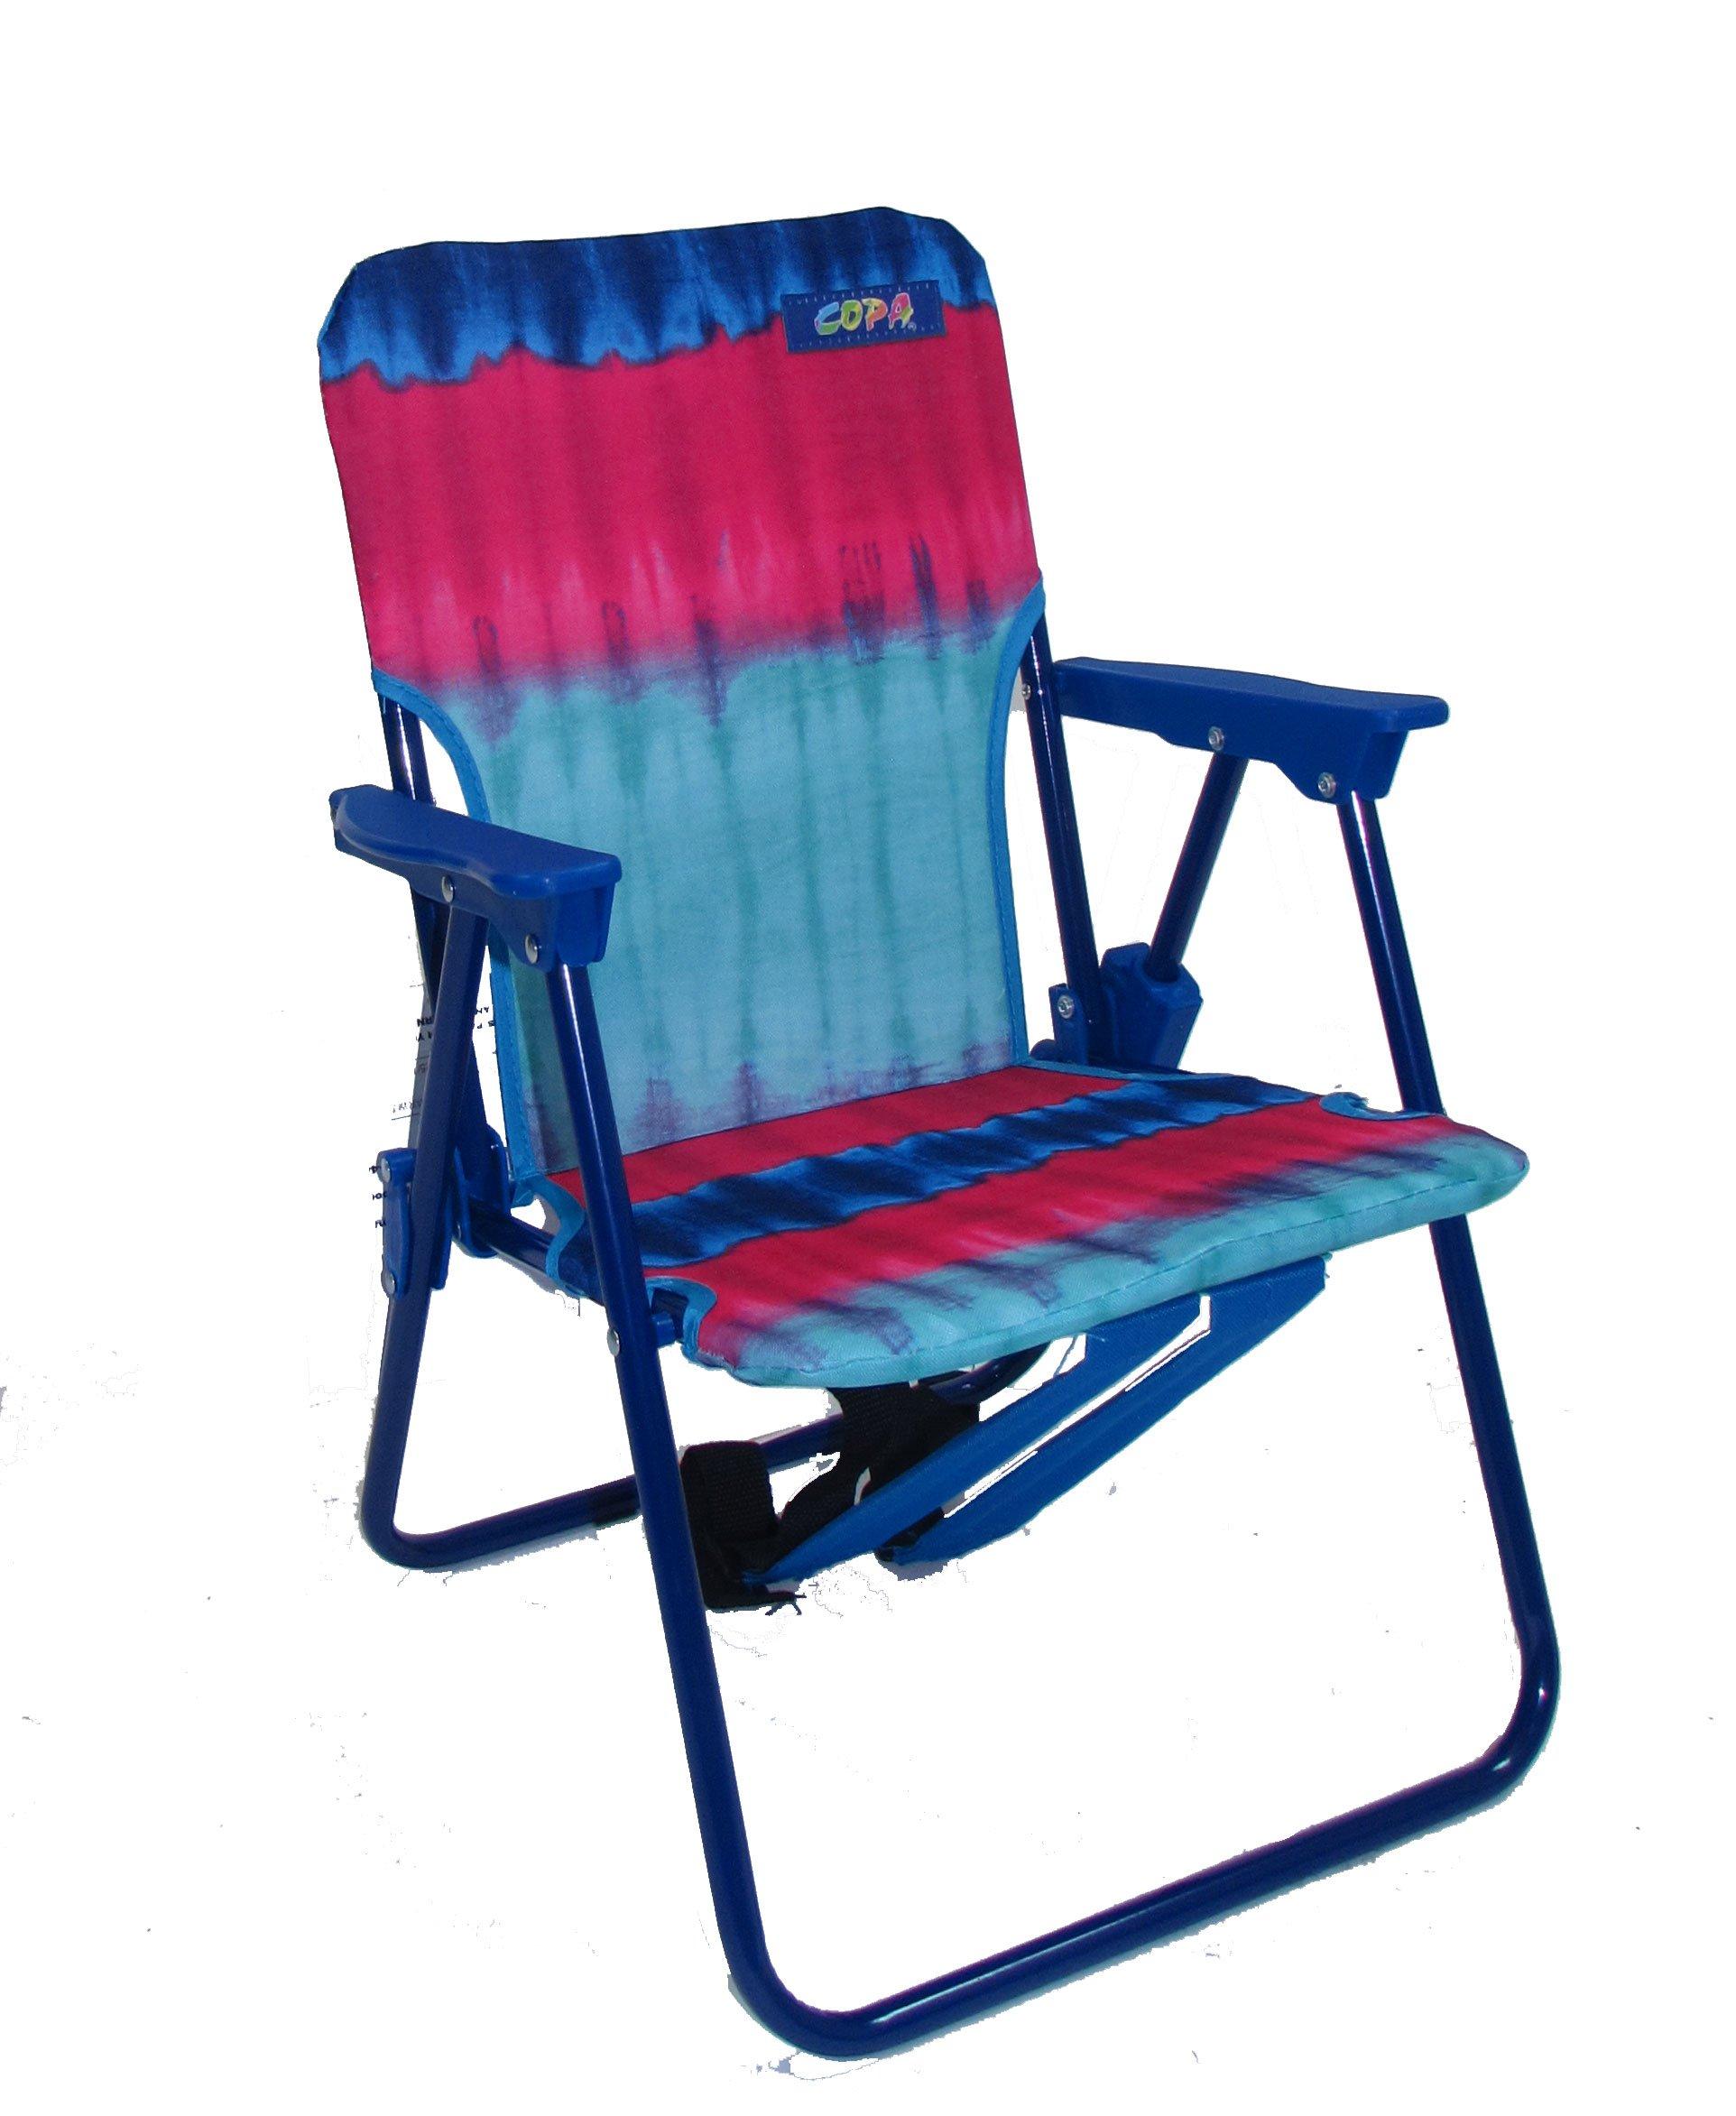 Cheap Folding Beach Chair Backpack Find Folding Beach